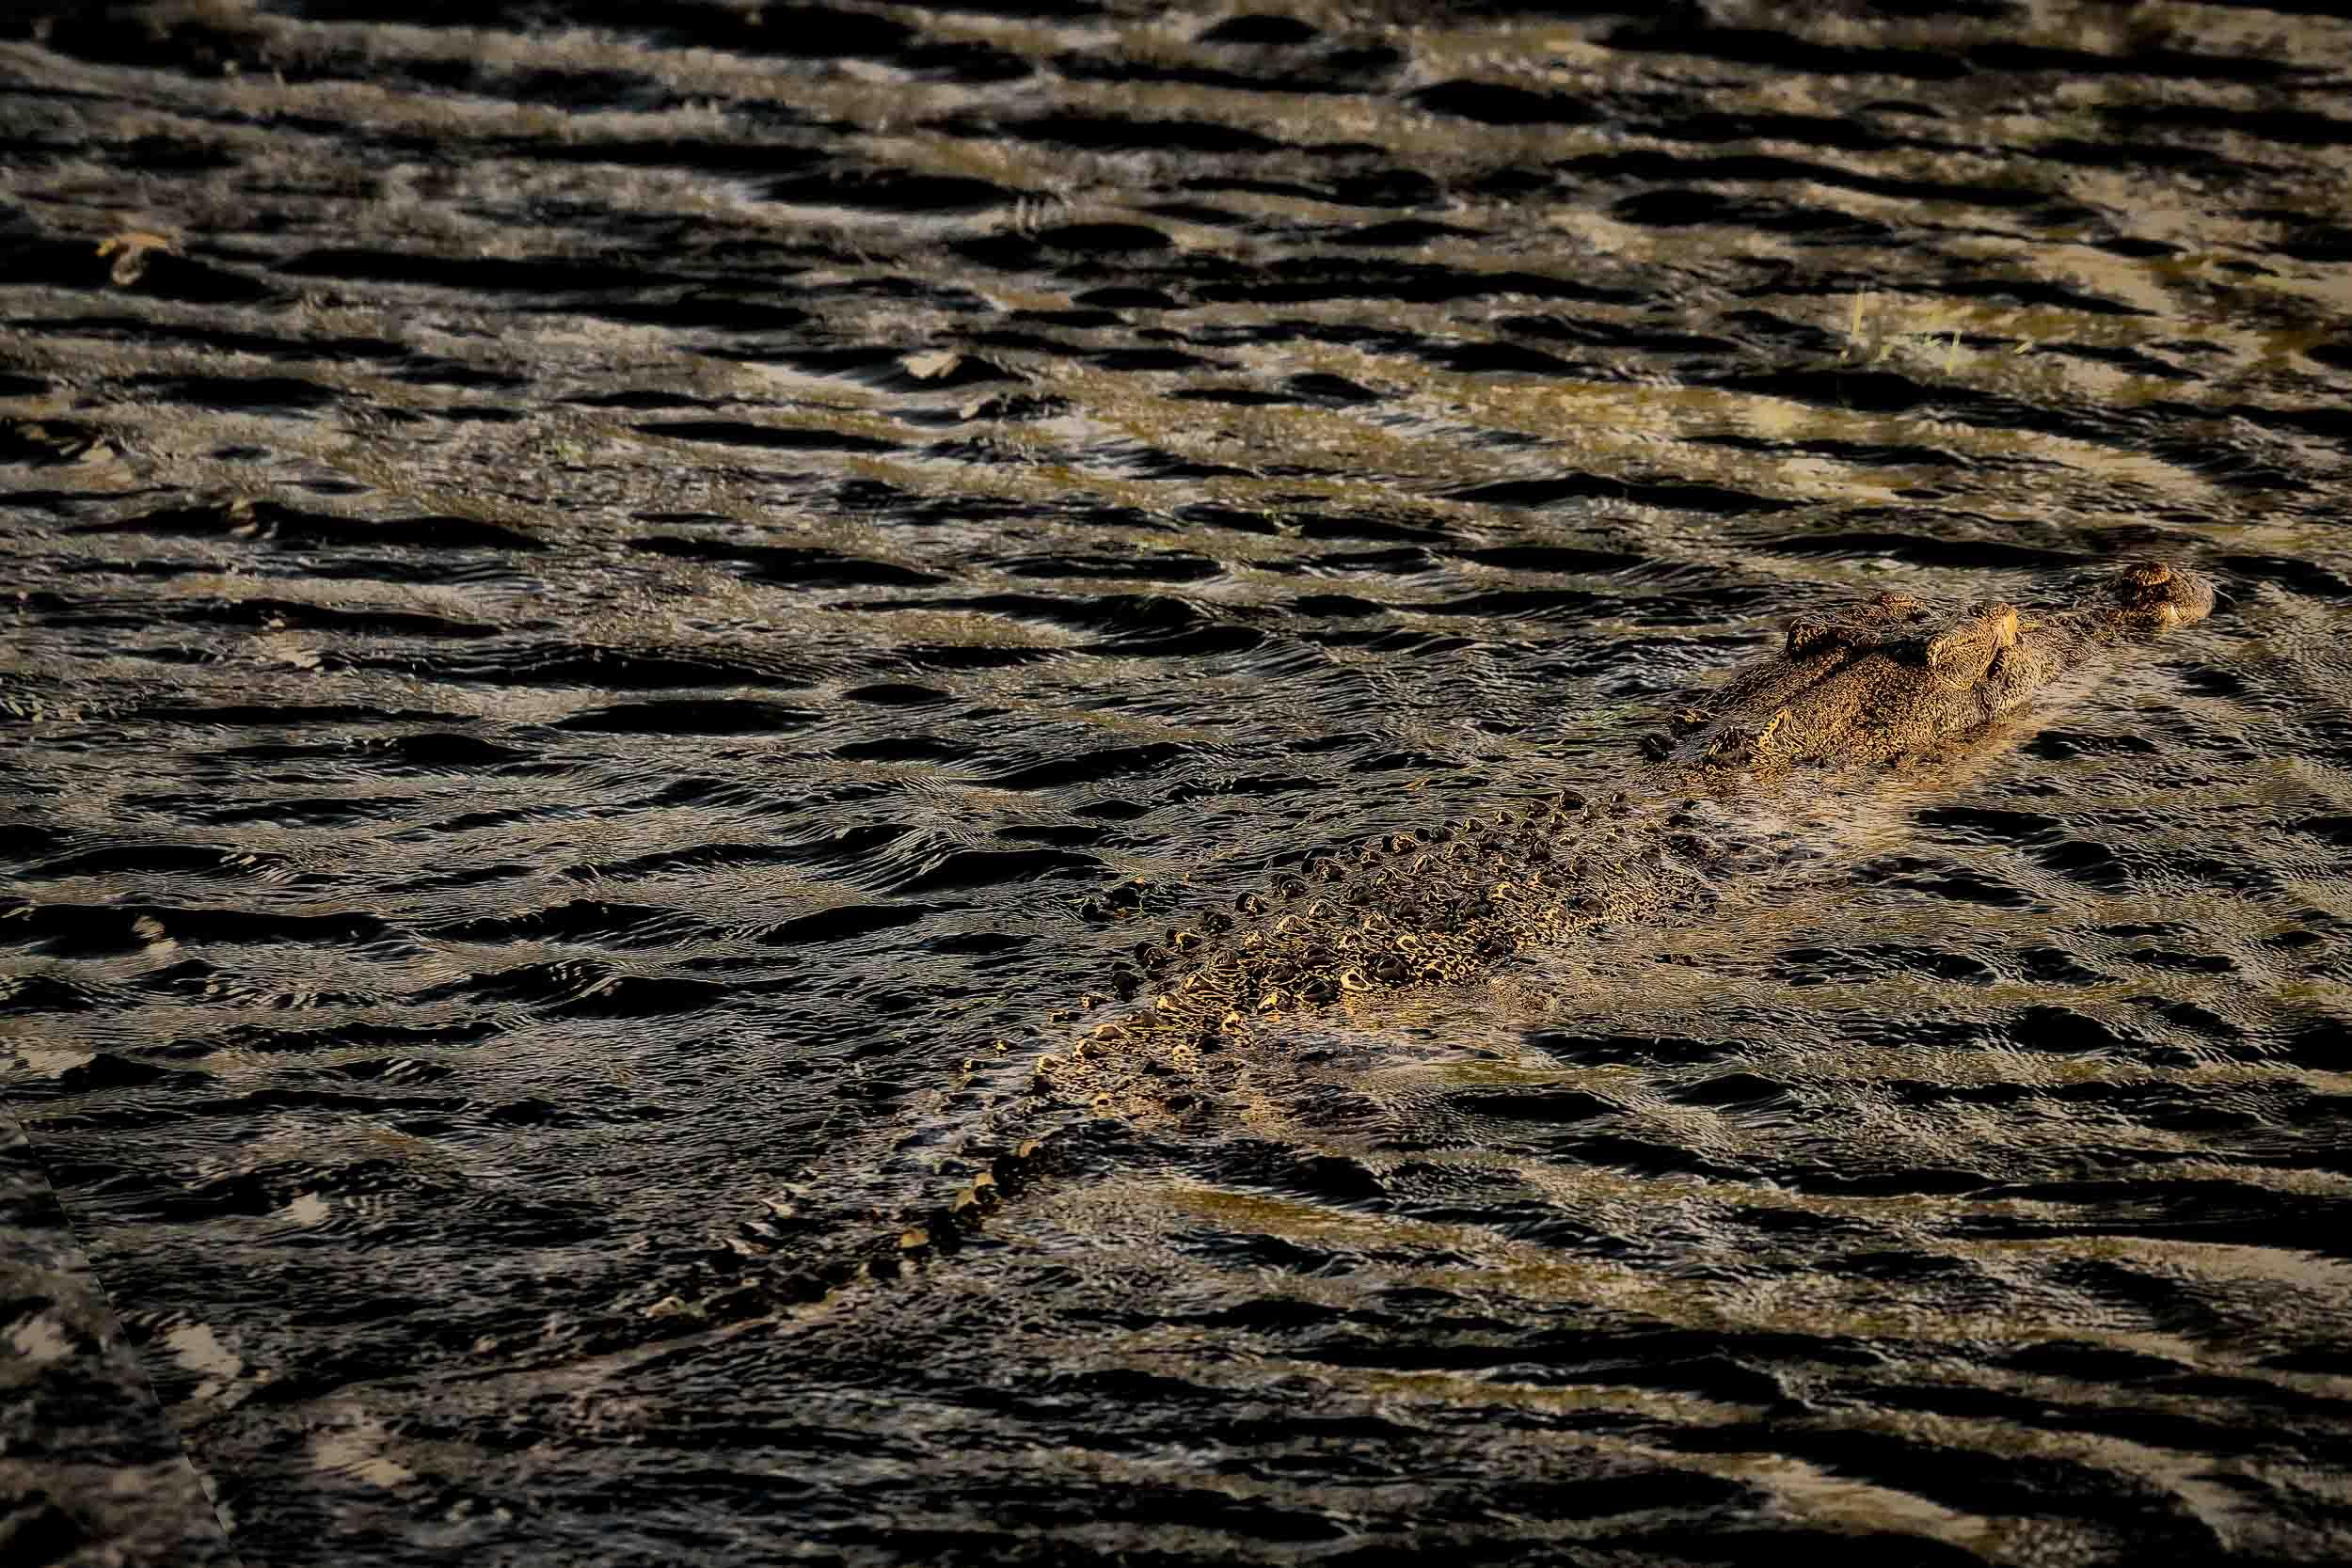 A    saltwater crocodile   , at sunset, ambling along in the    Yellow Waters Billabong    in Kakadu National Park,    Australia   .